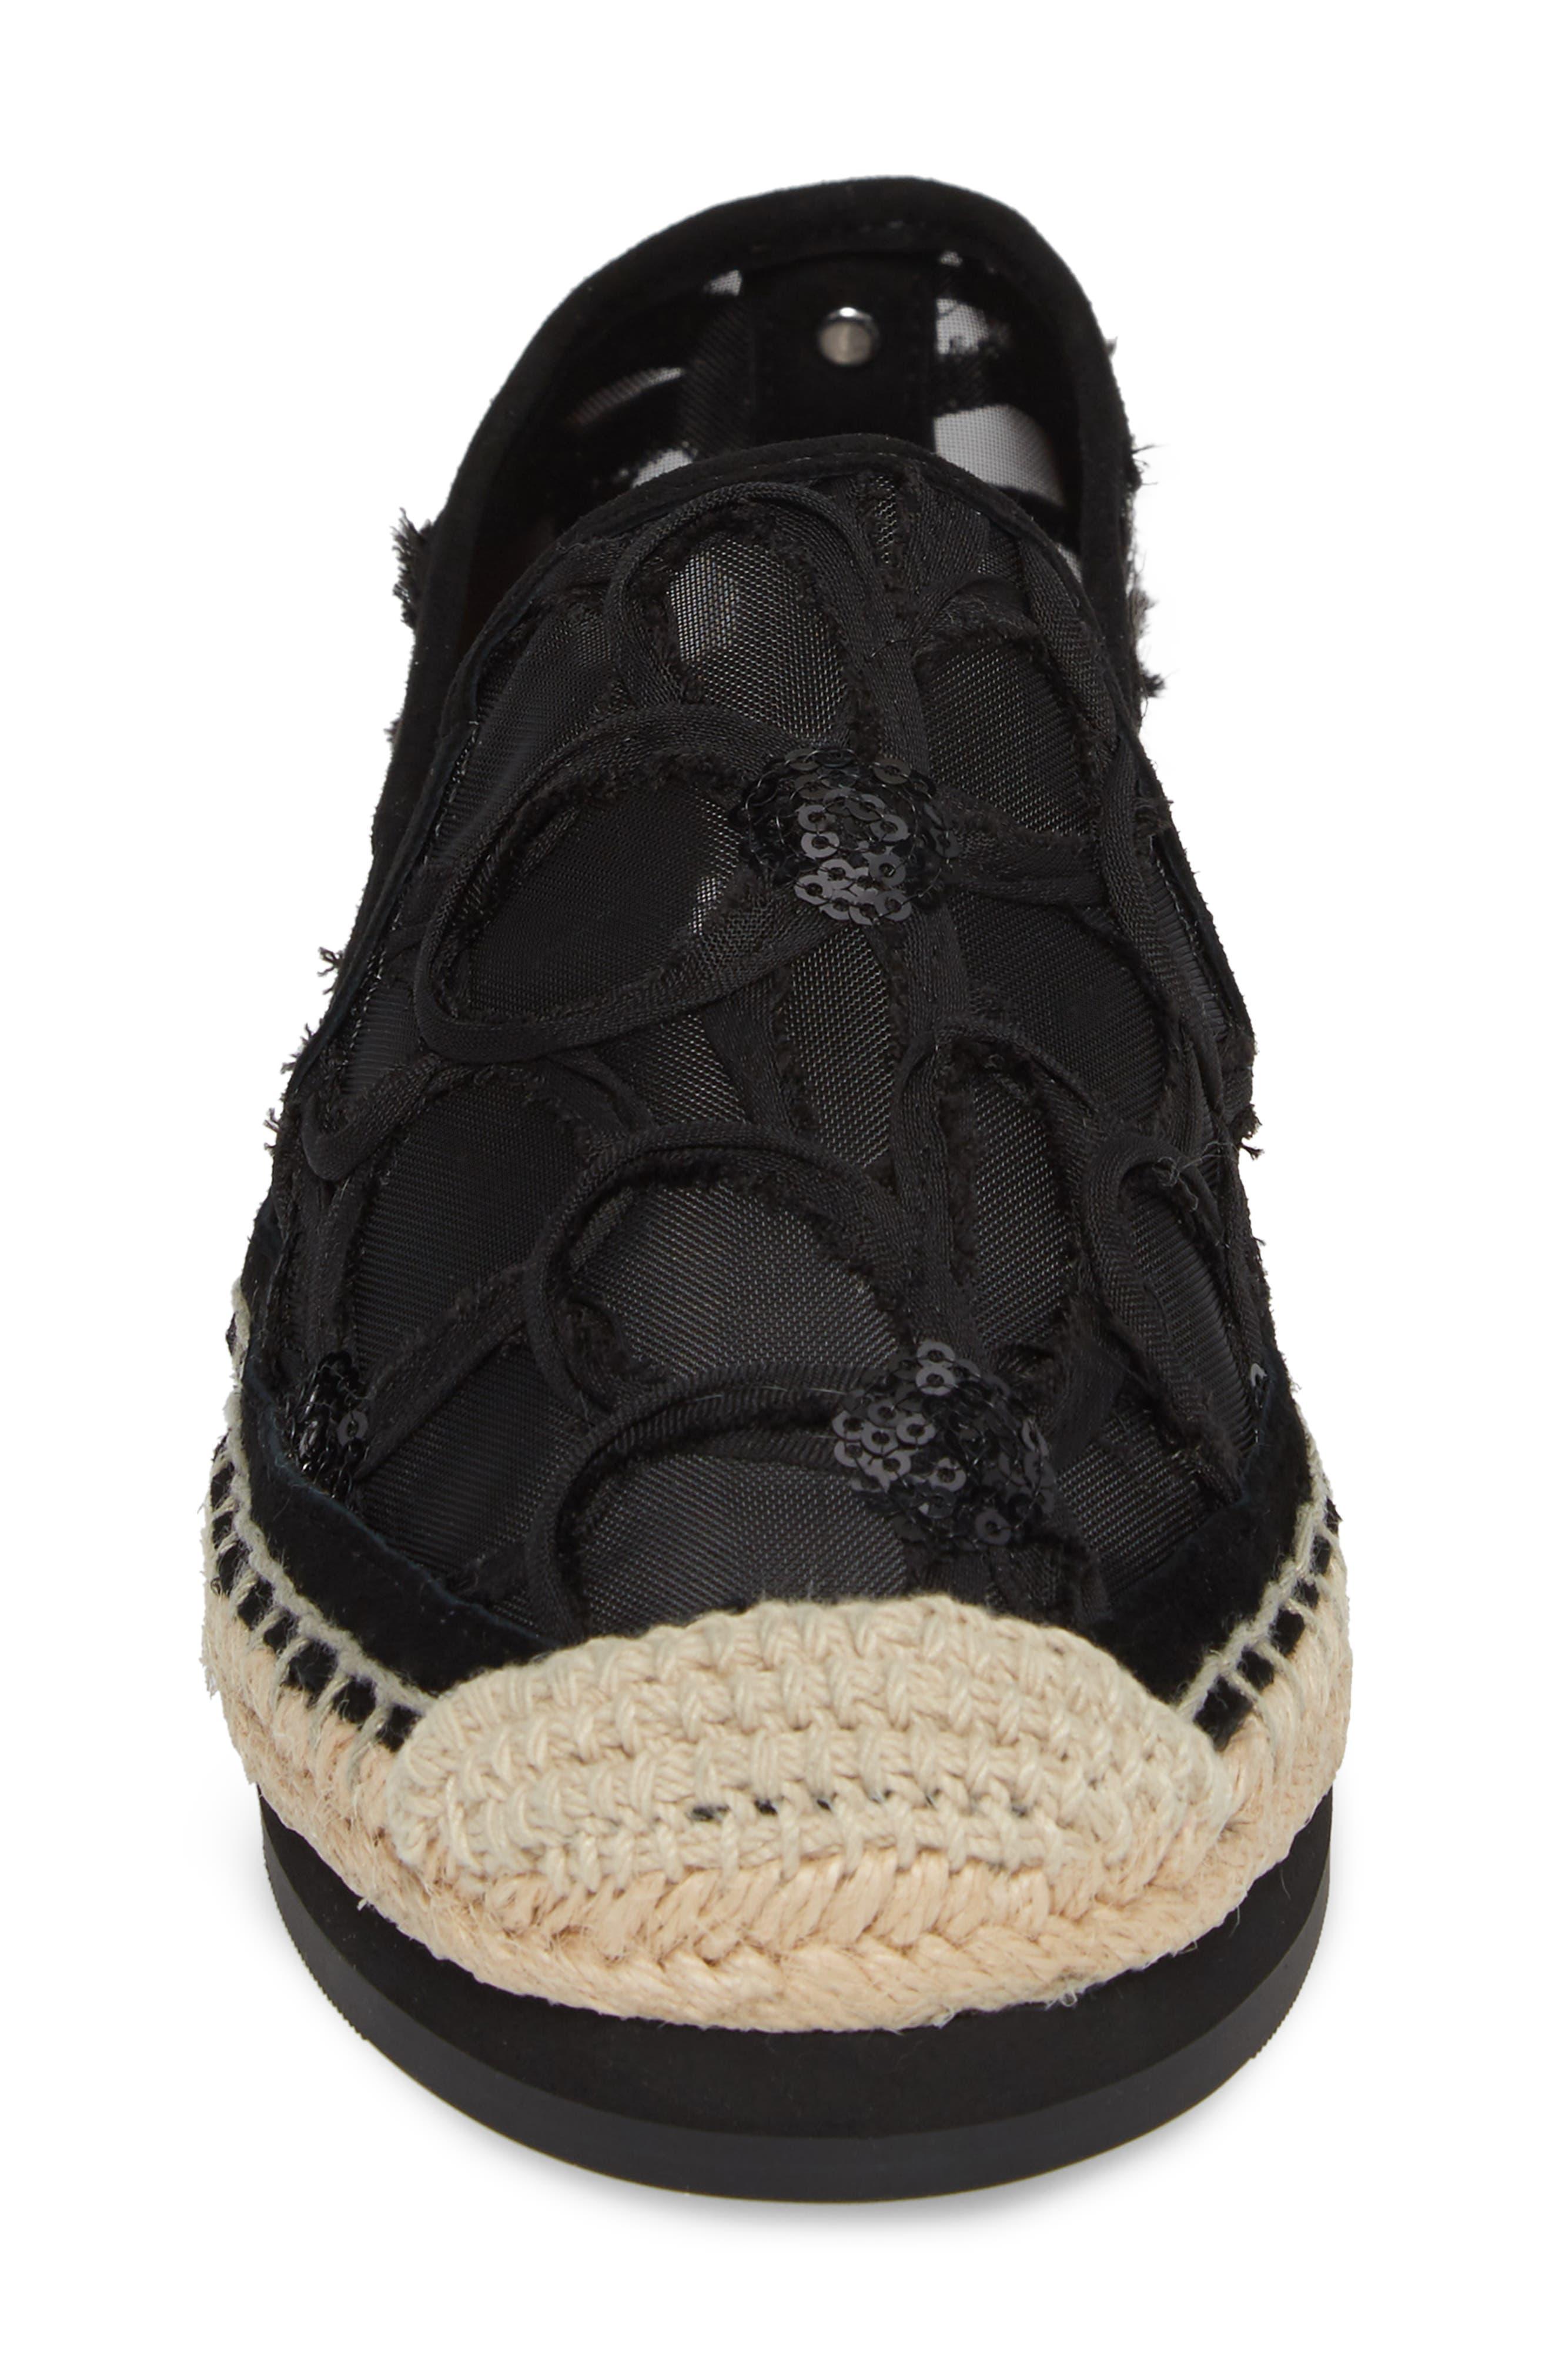 Sara Espadrille Platform Loafer,                             Alternate thumbnail 4, color,                             BLACK MESH FABRIC